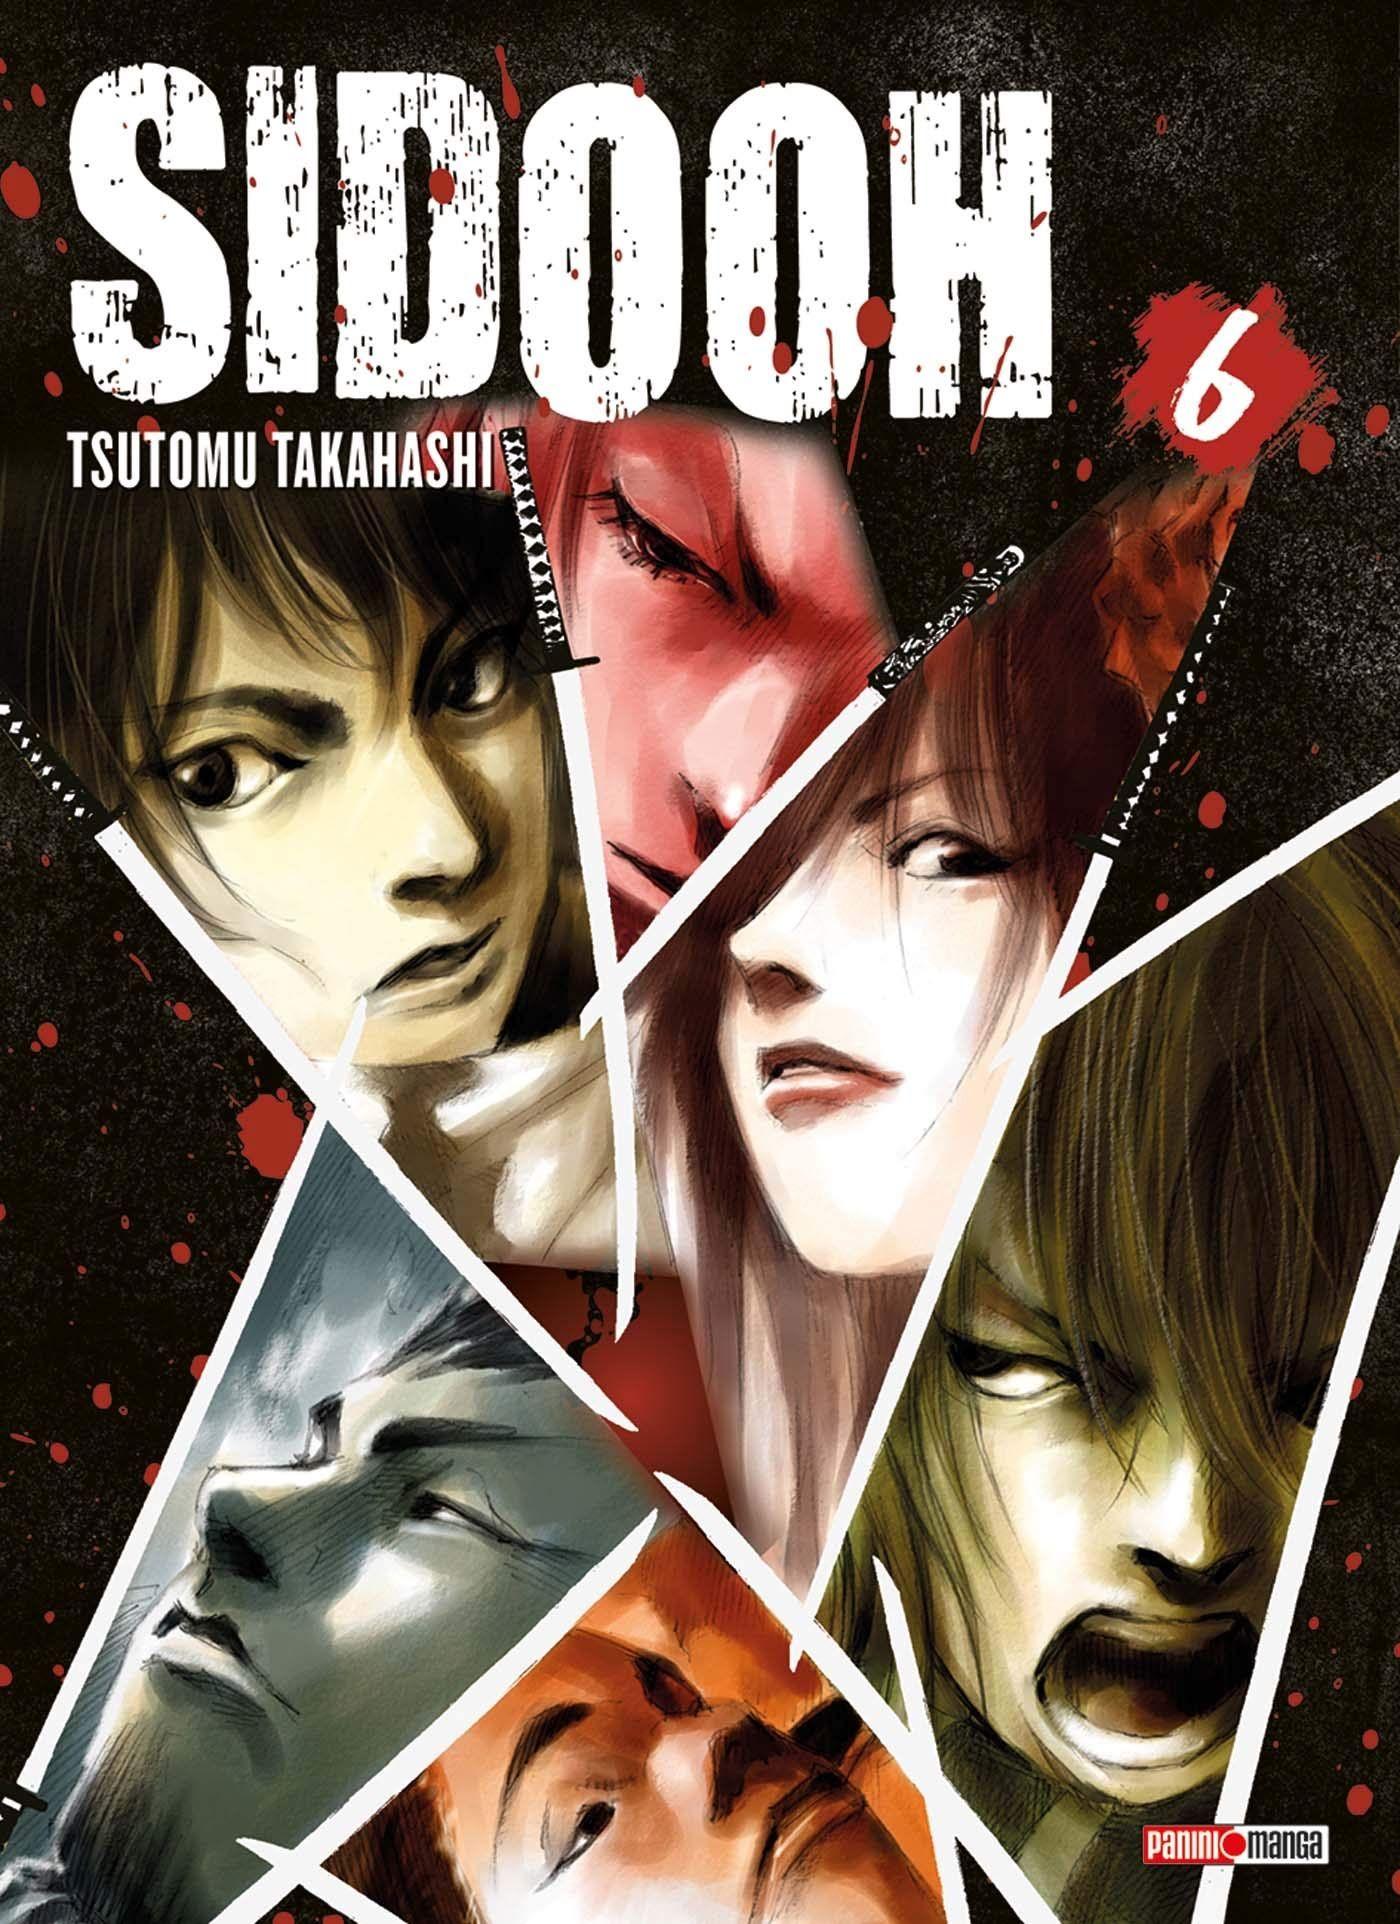 Sortie Manga au Québec JUILLET 2021 Sidooh-6-perfect-panini